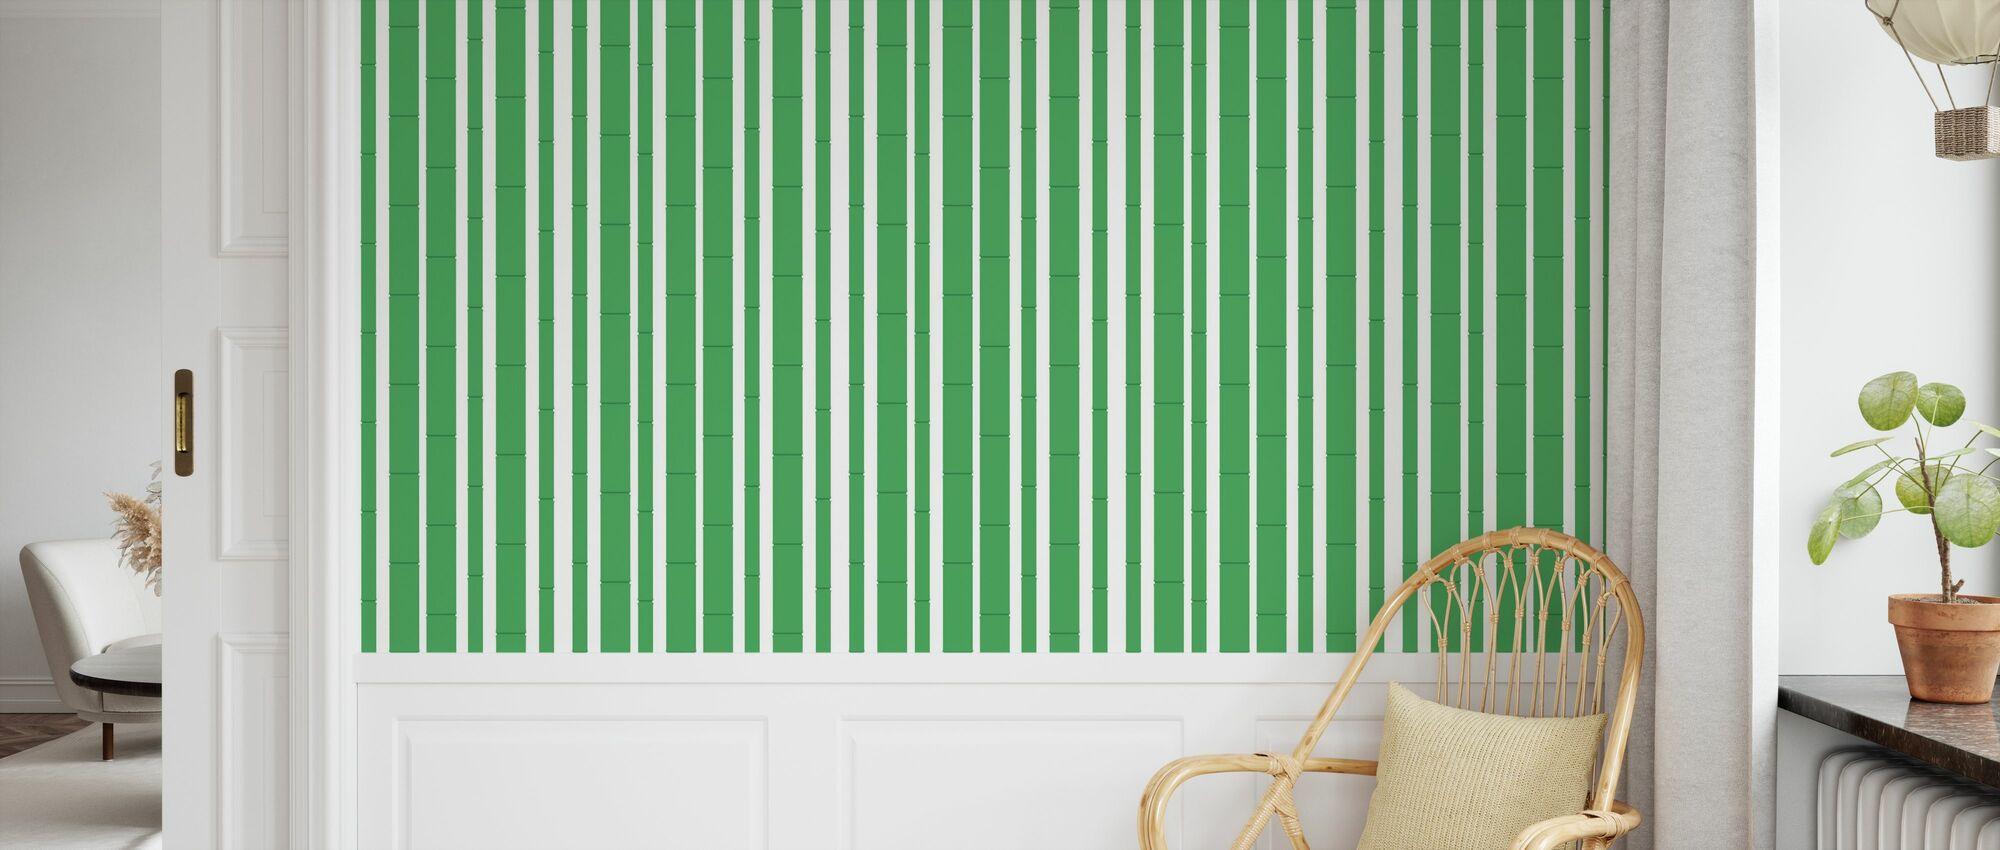 Bambu - Green - Wallpaper - Kids Room